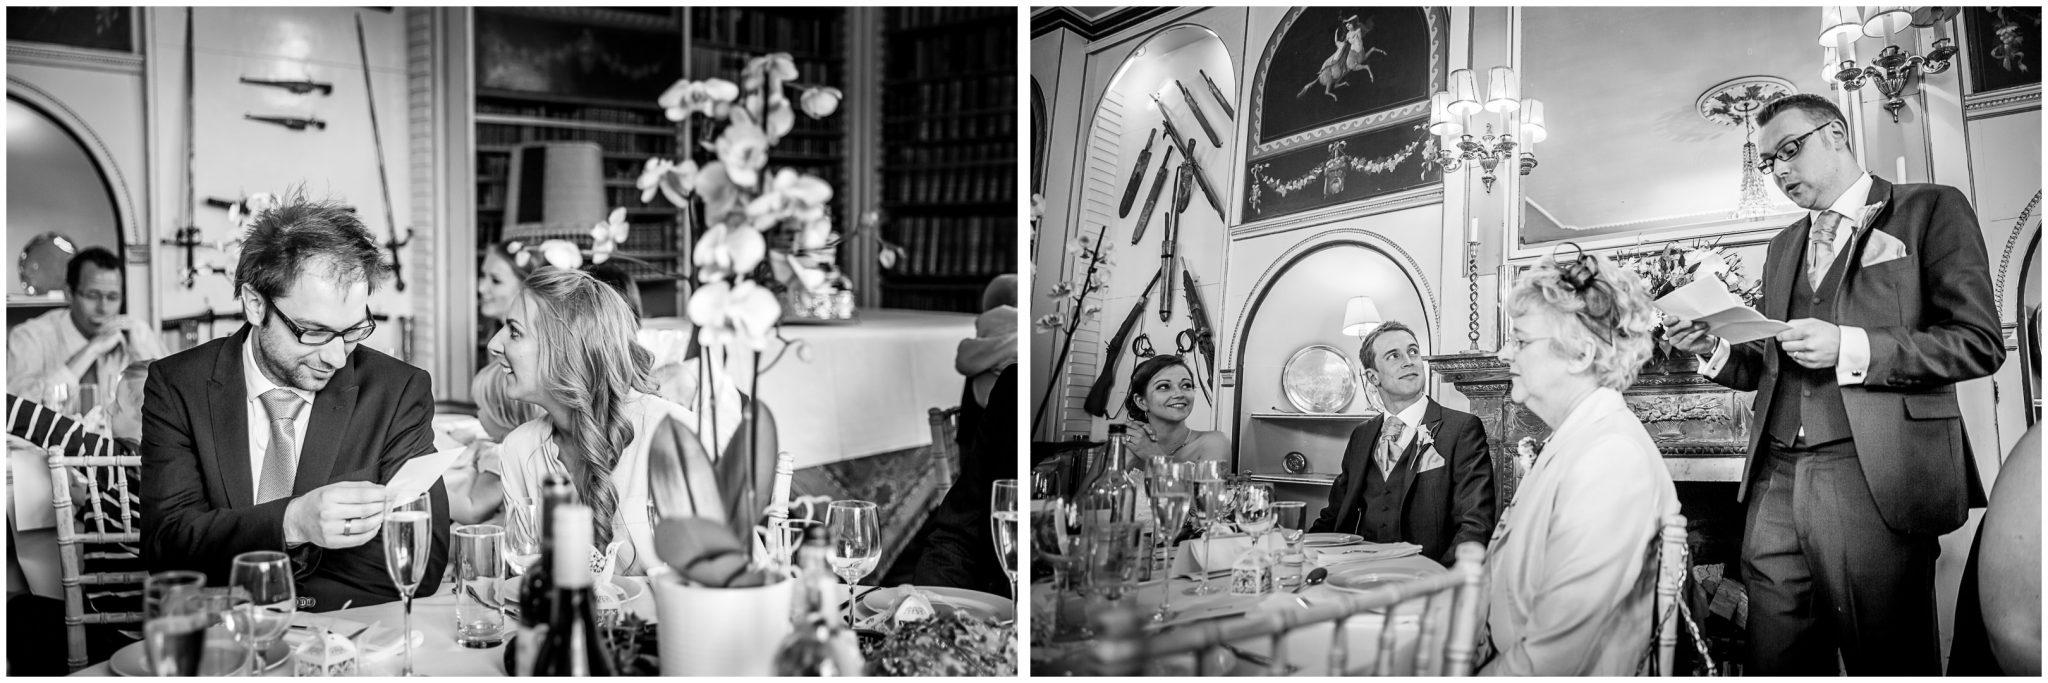 Avington Park wedding photography best man speech